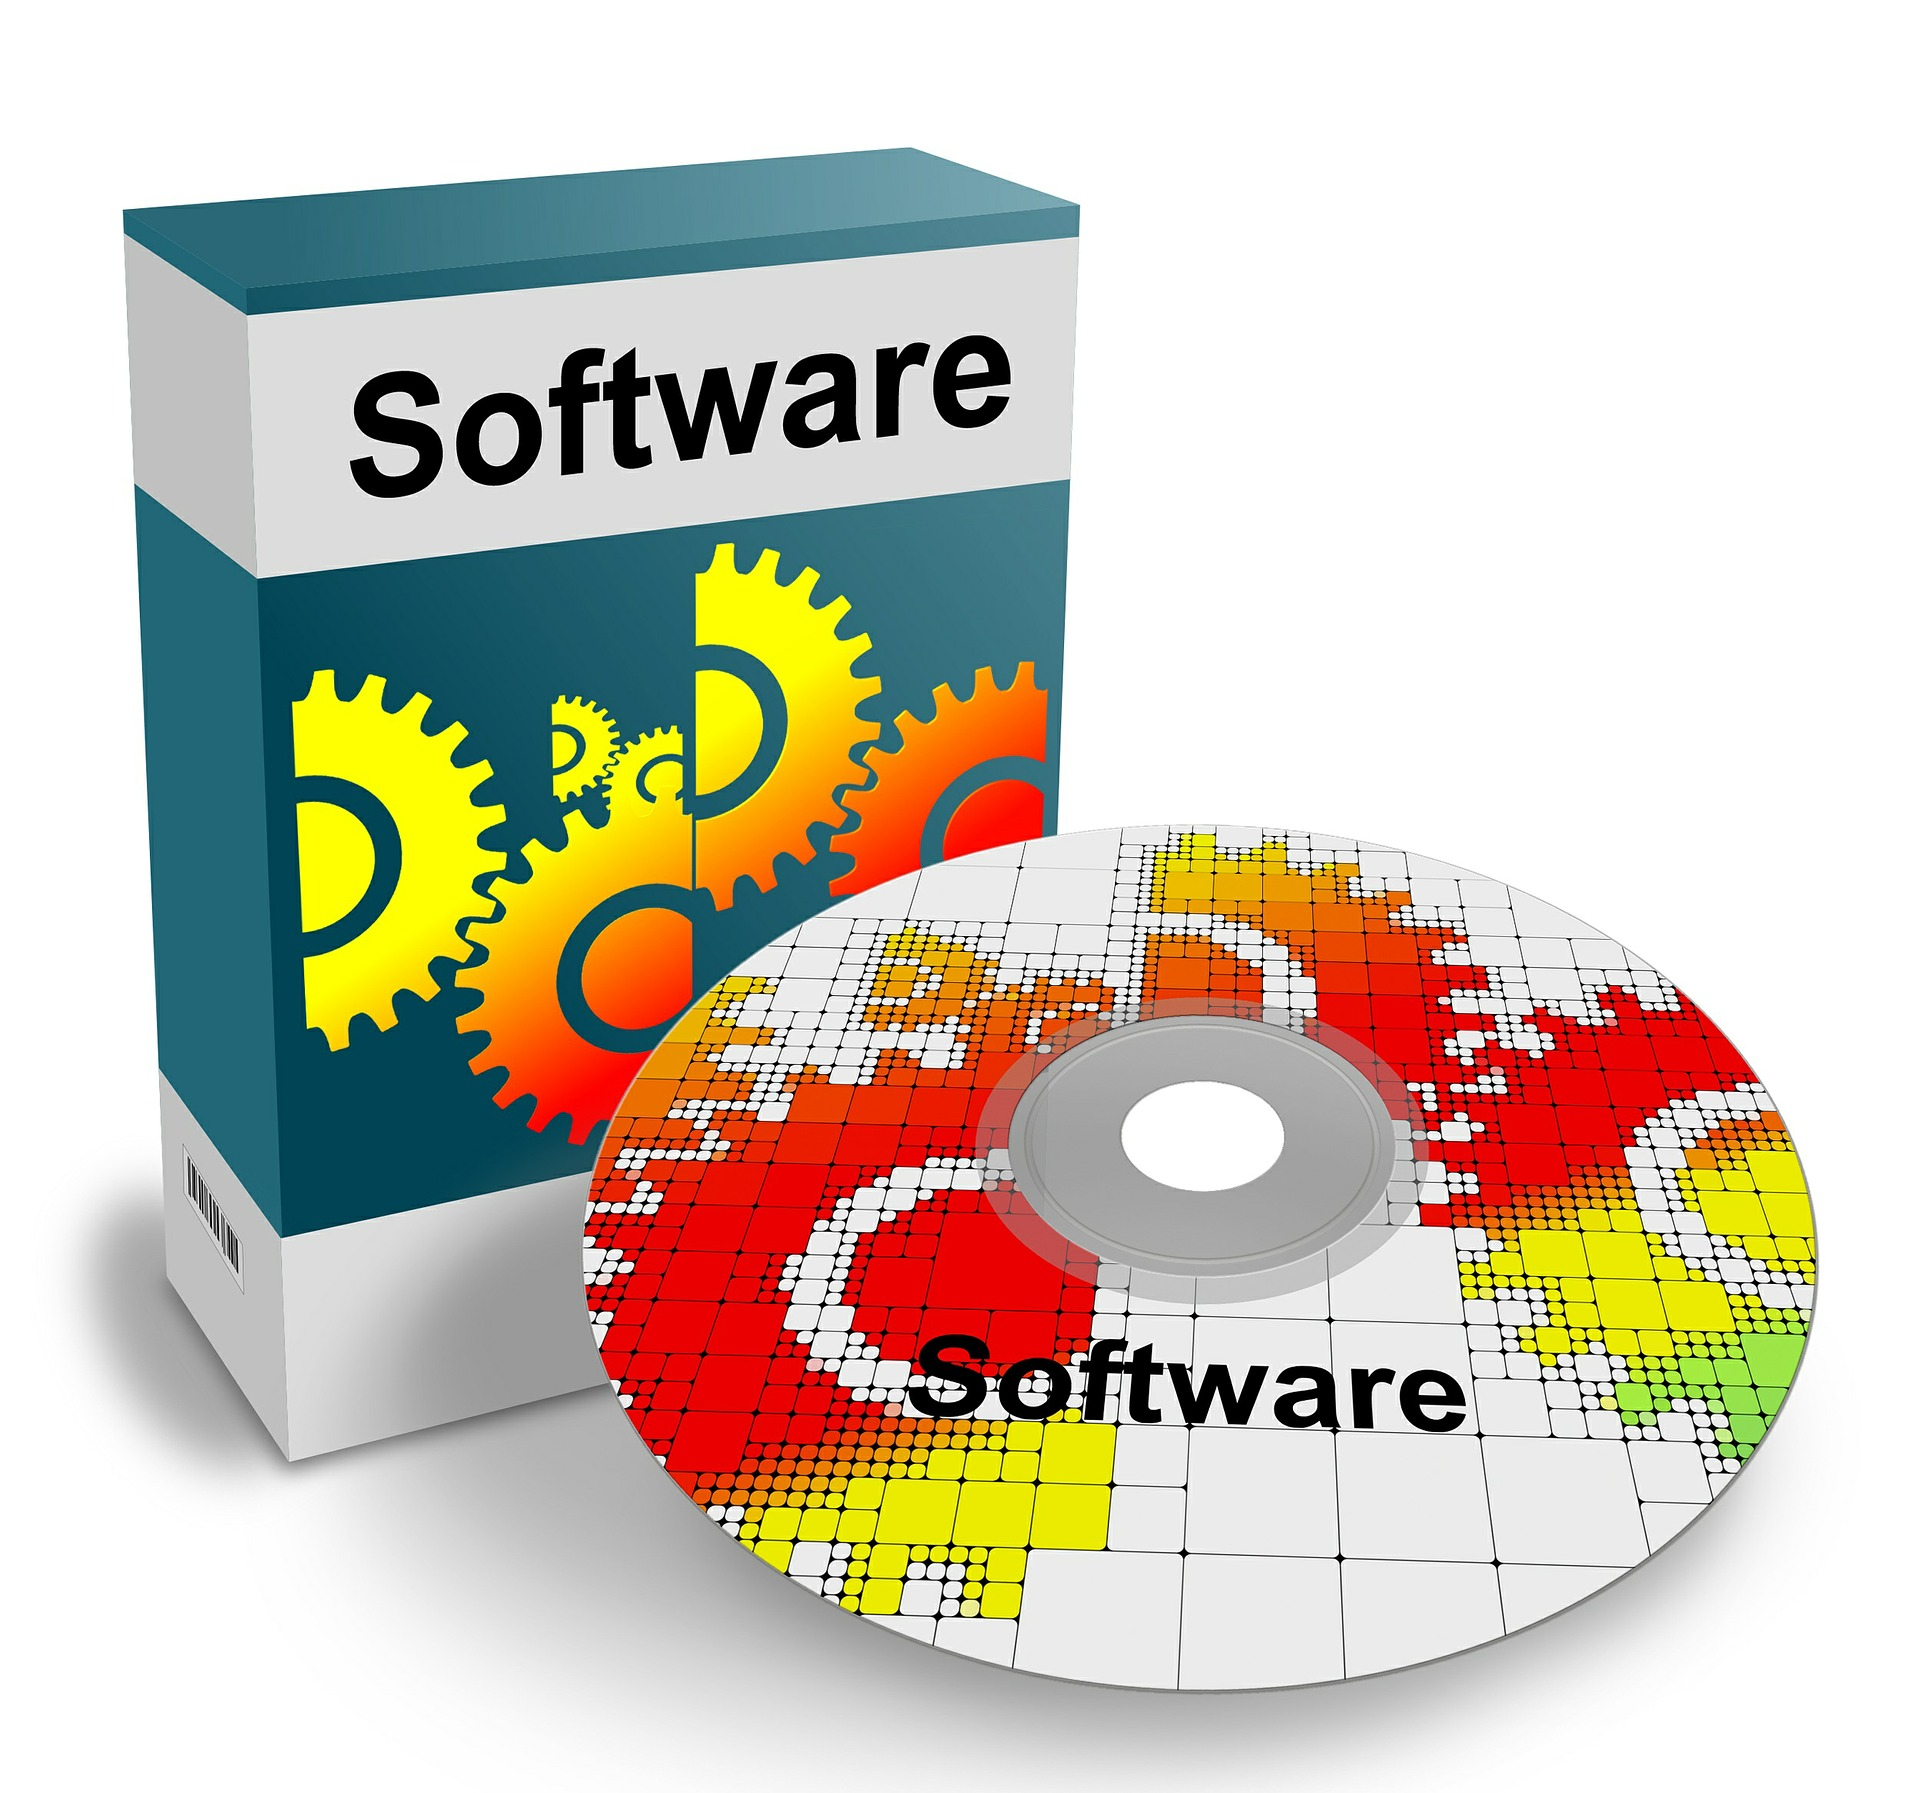 software-417880_1920.jpg